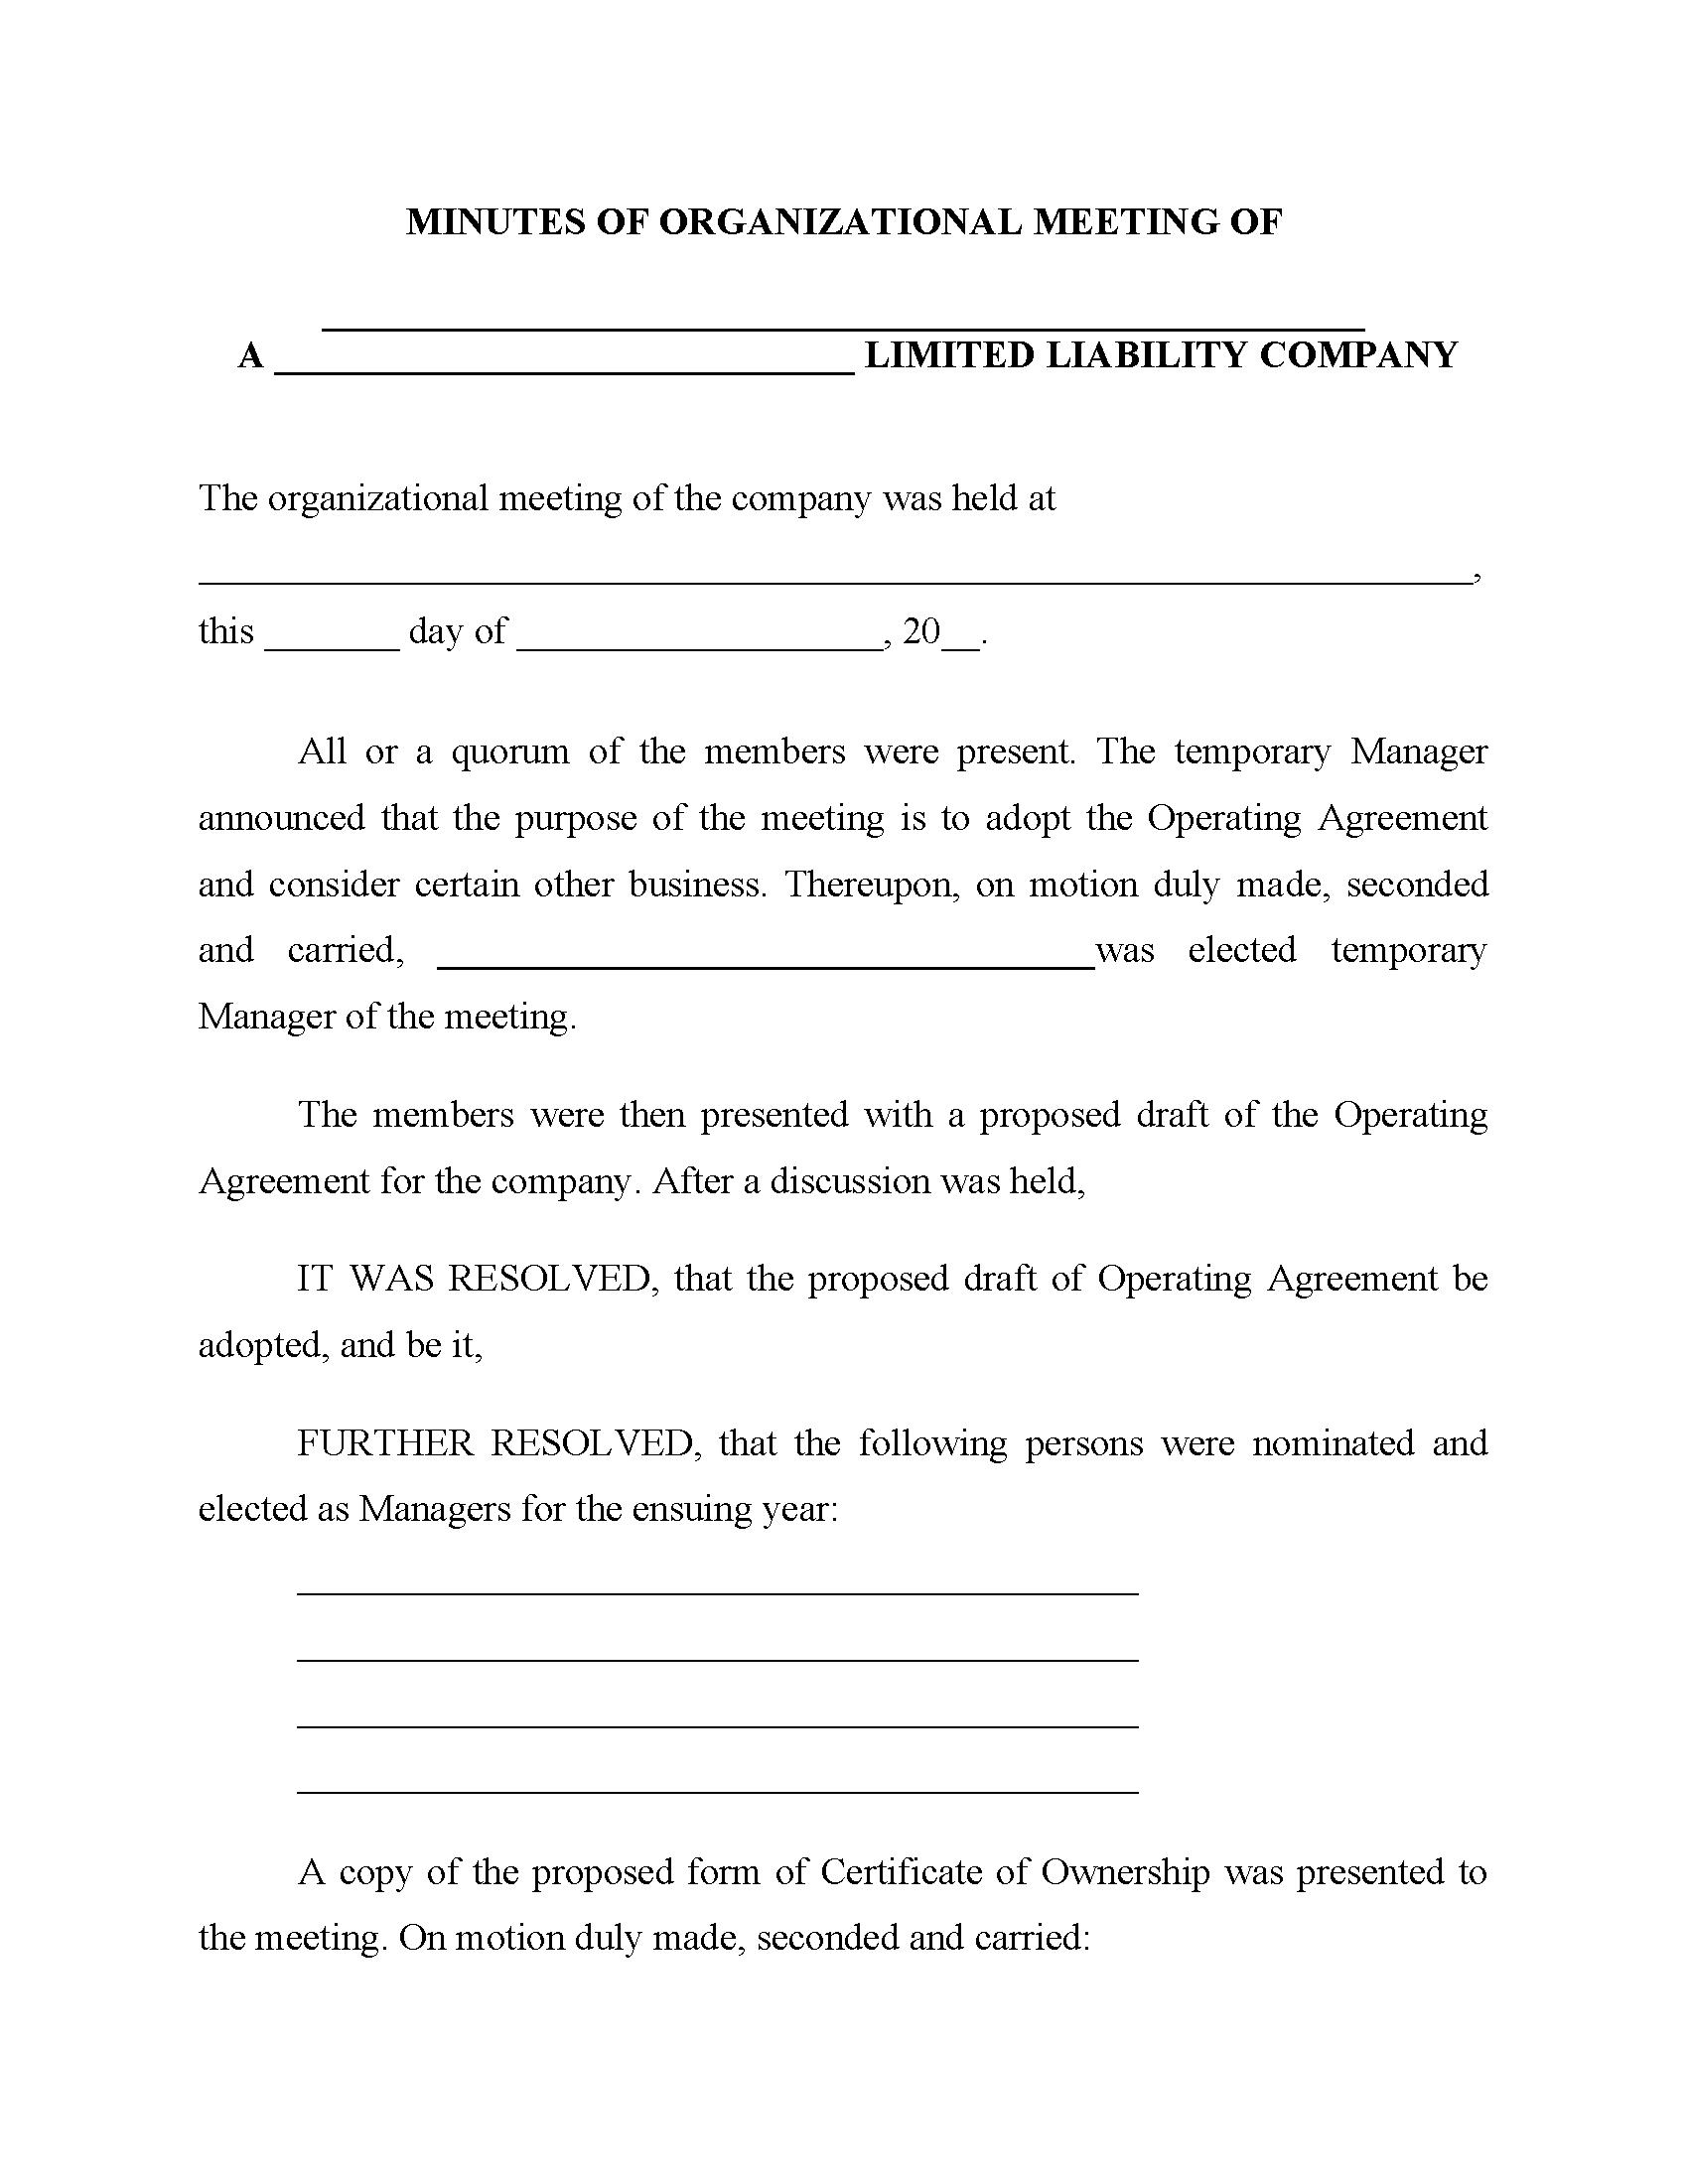 Minutes of LLC Organizational Meeting